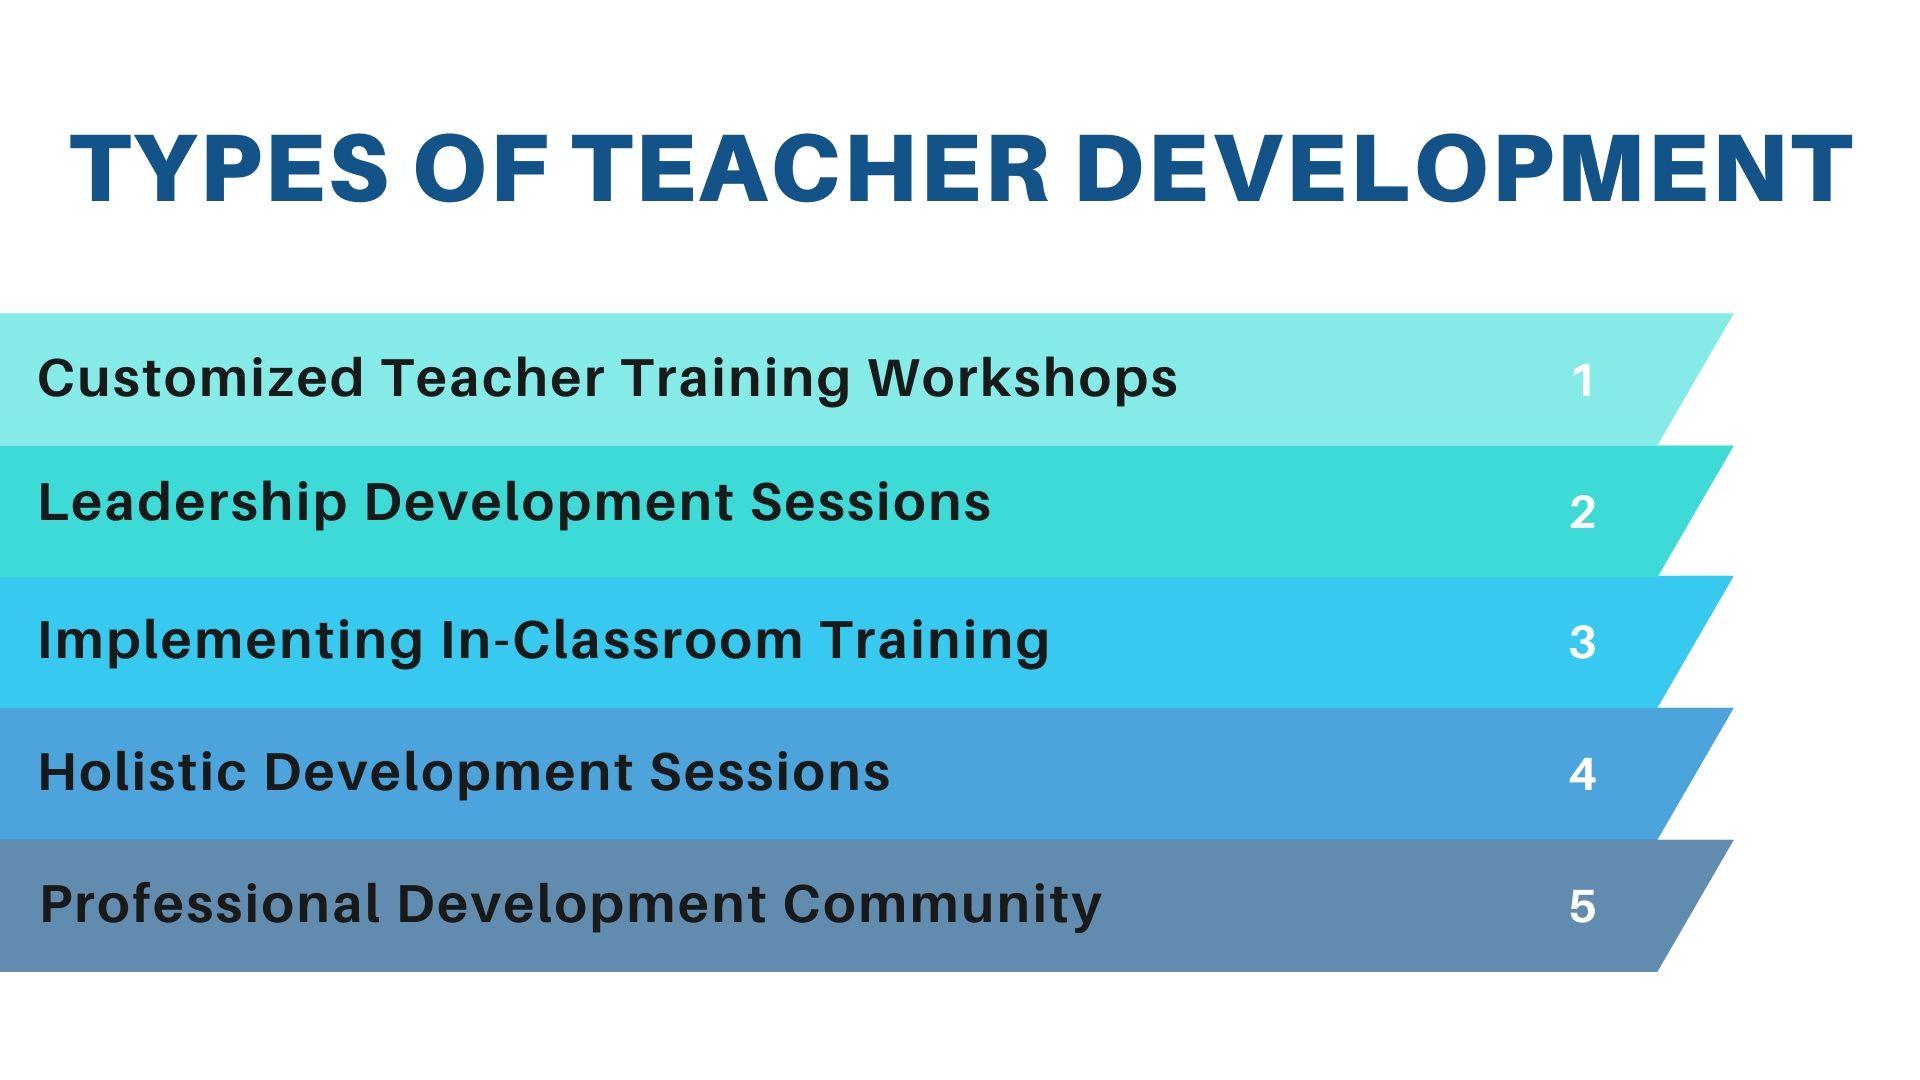 Types Teacher Development - Global Career Counsellor Certification